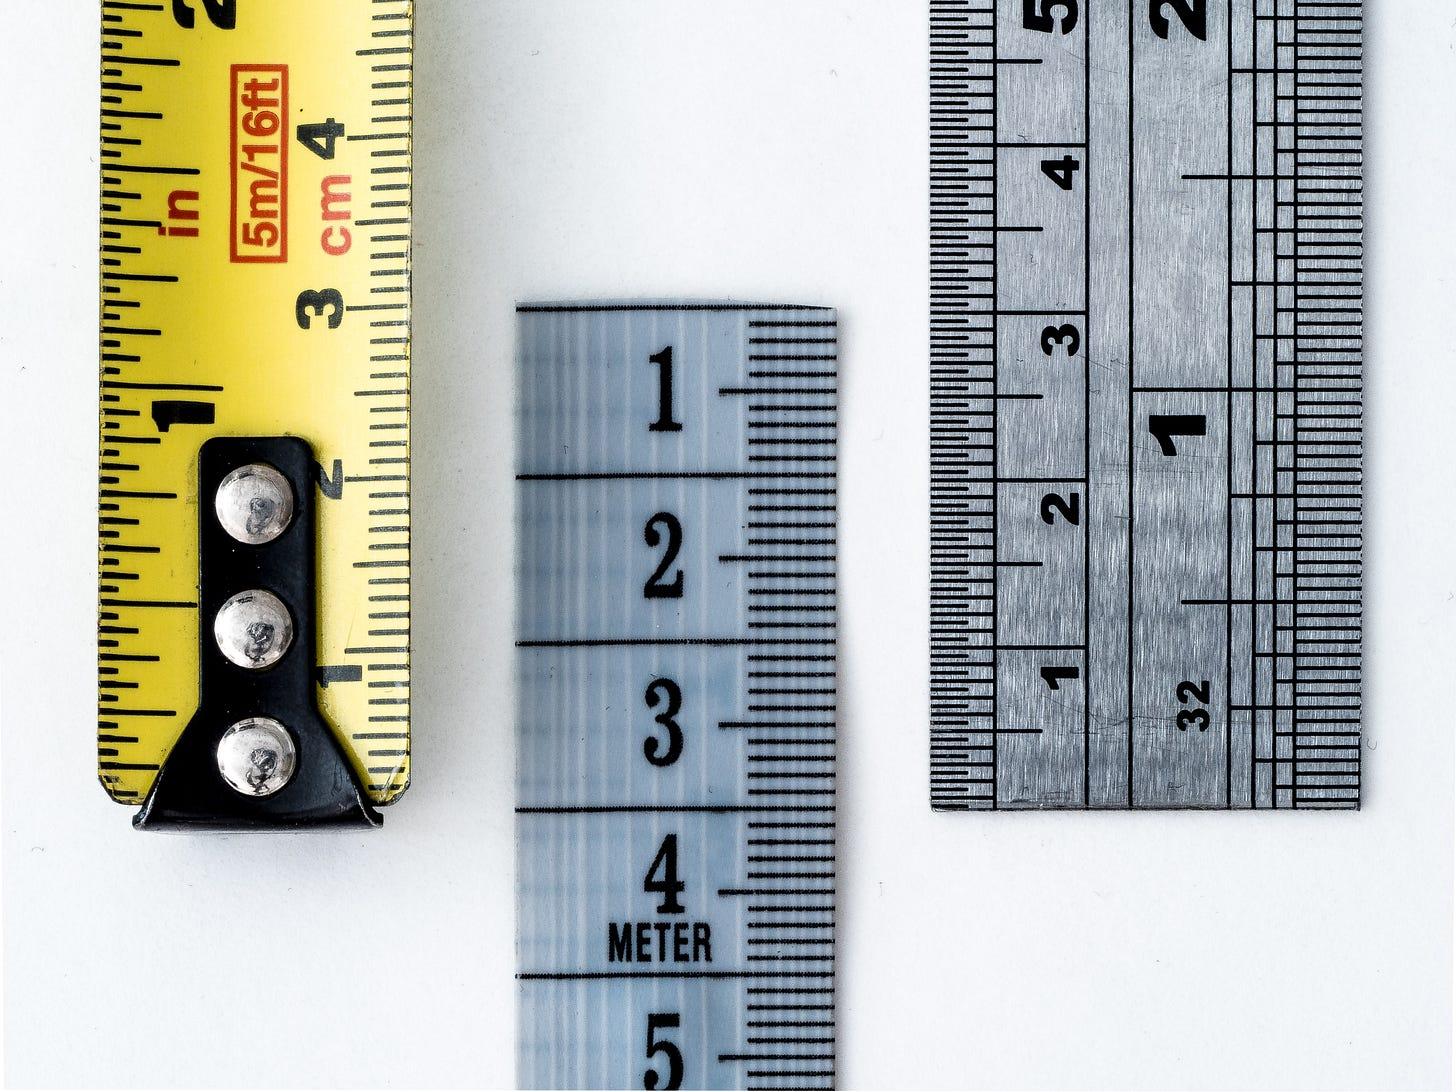 3 tape measures